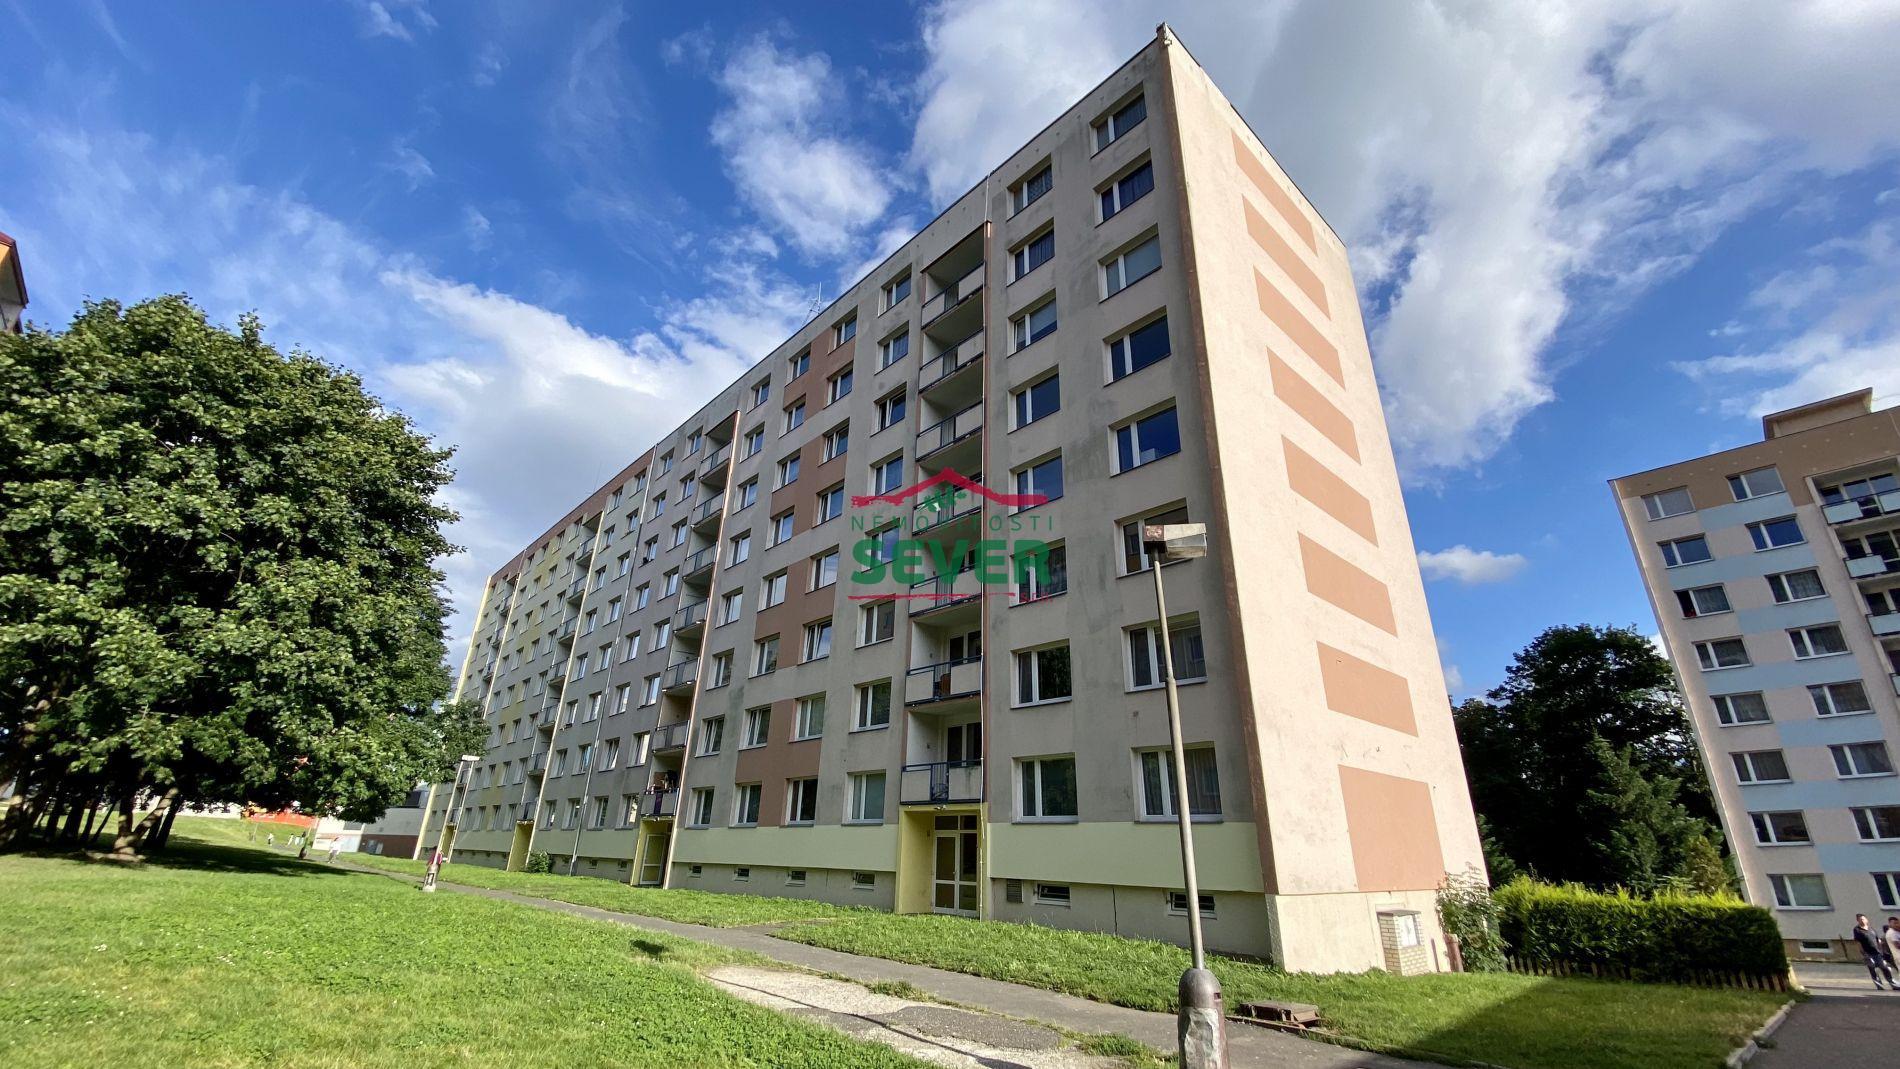 Prodej, byt 3+1, DV, Krupka, ul. Karla Čapka, okr. Teplice